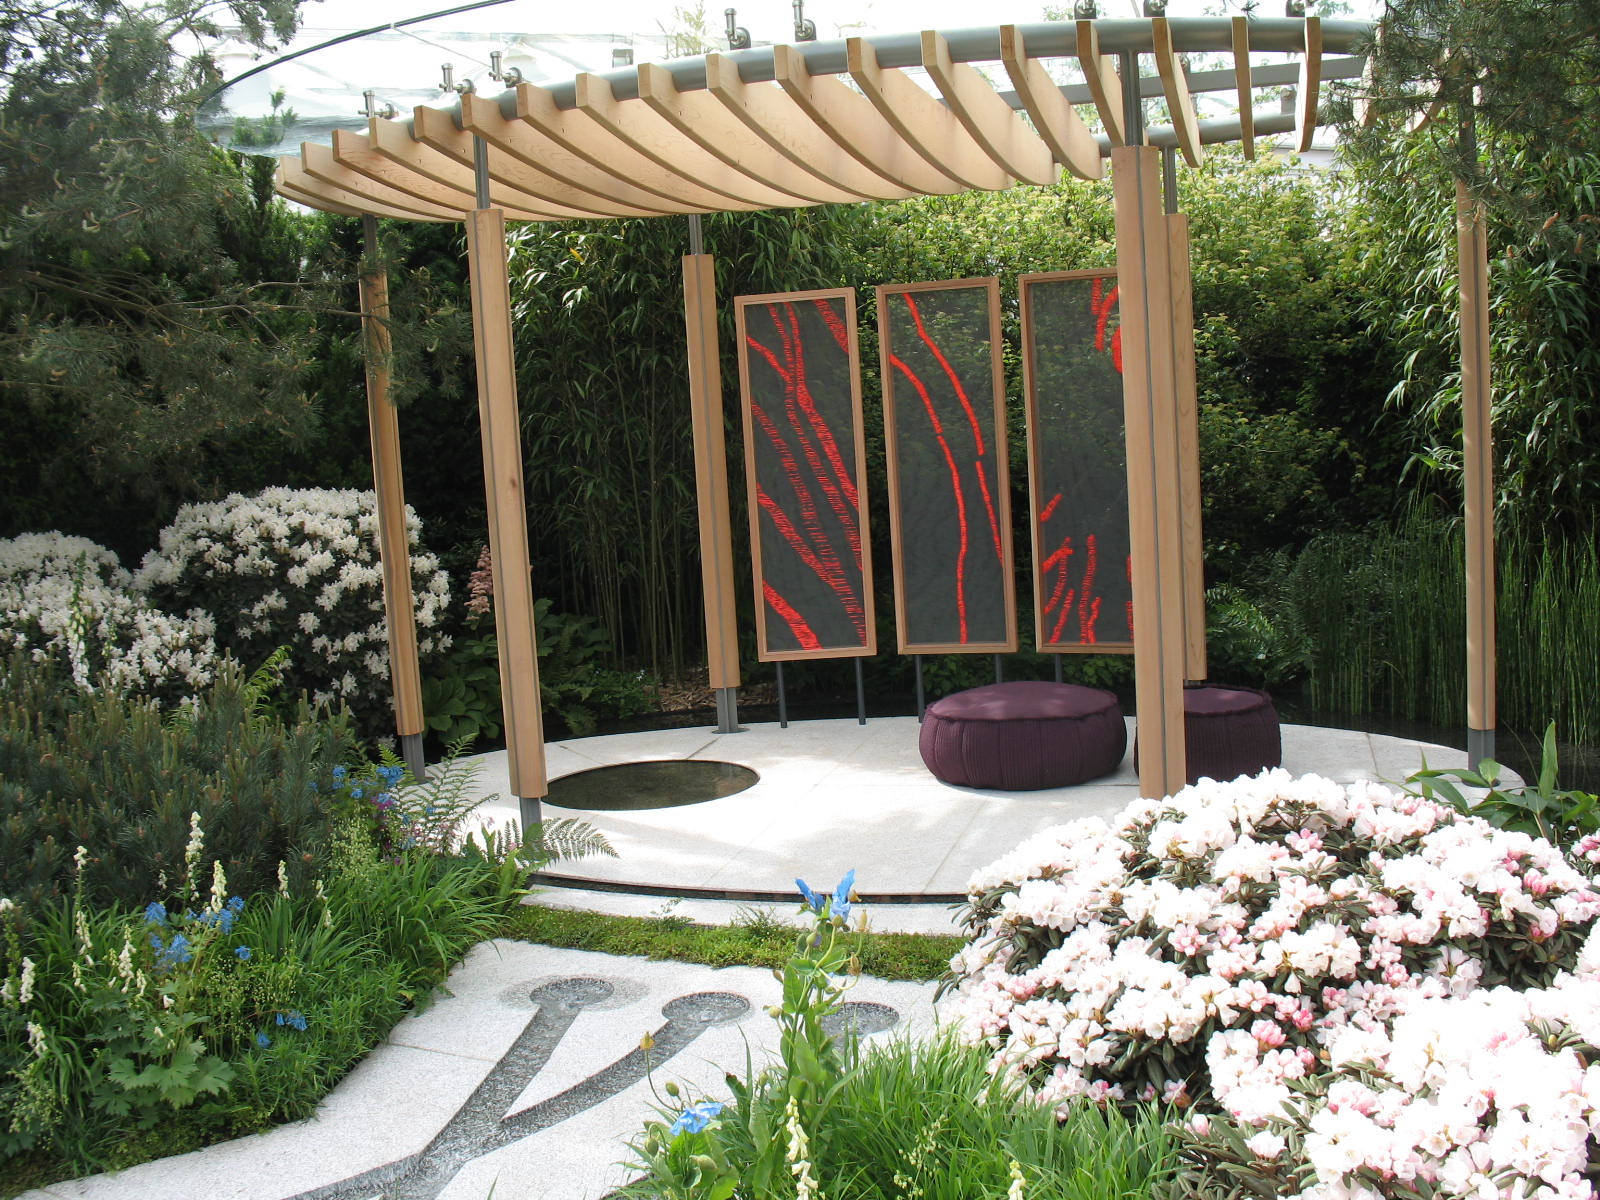 rhs chelsea flower show redux alice 39 s garden travel buzz. Black Bedroom Furniture Sets. Home Design Ideas